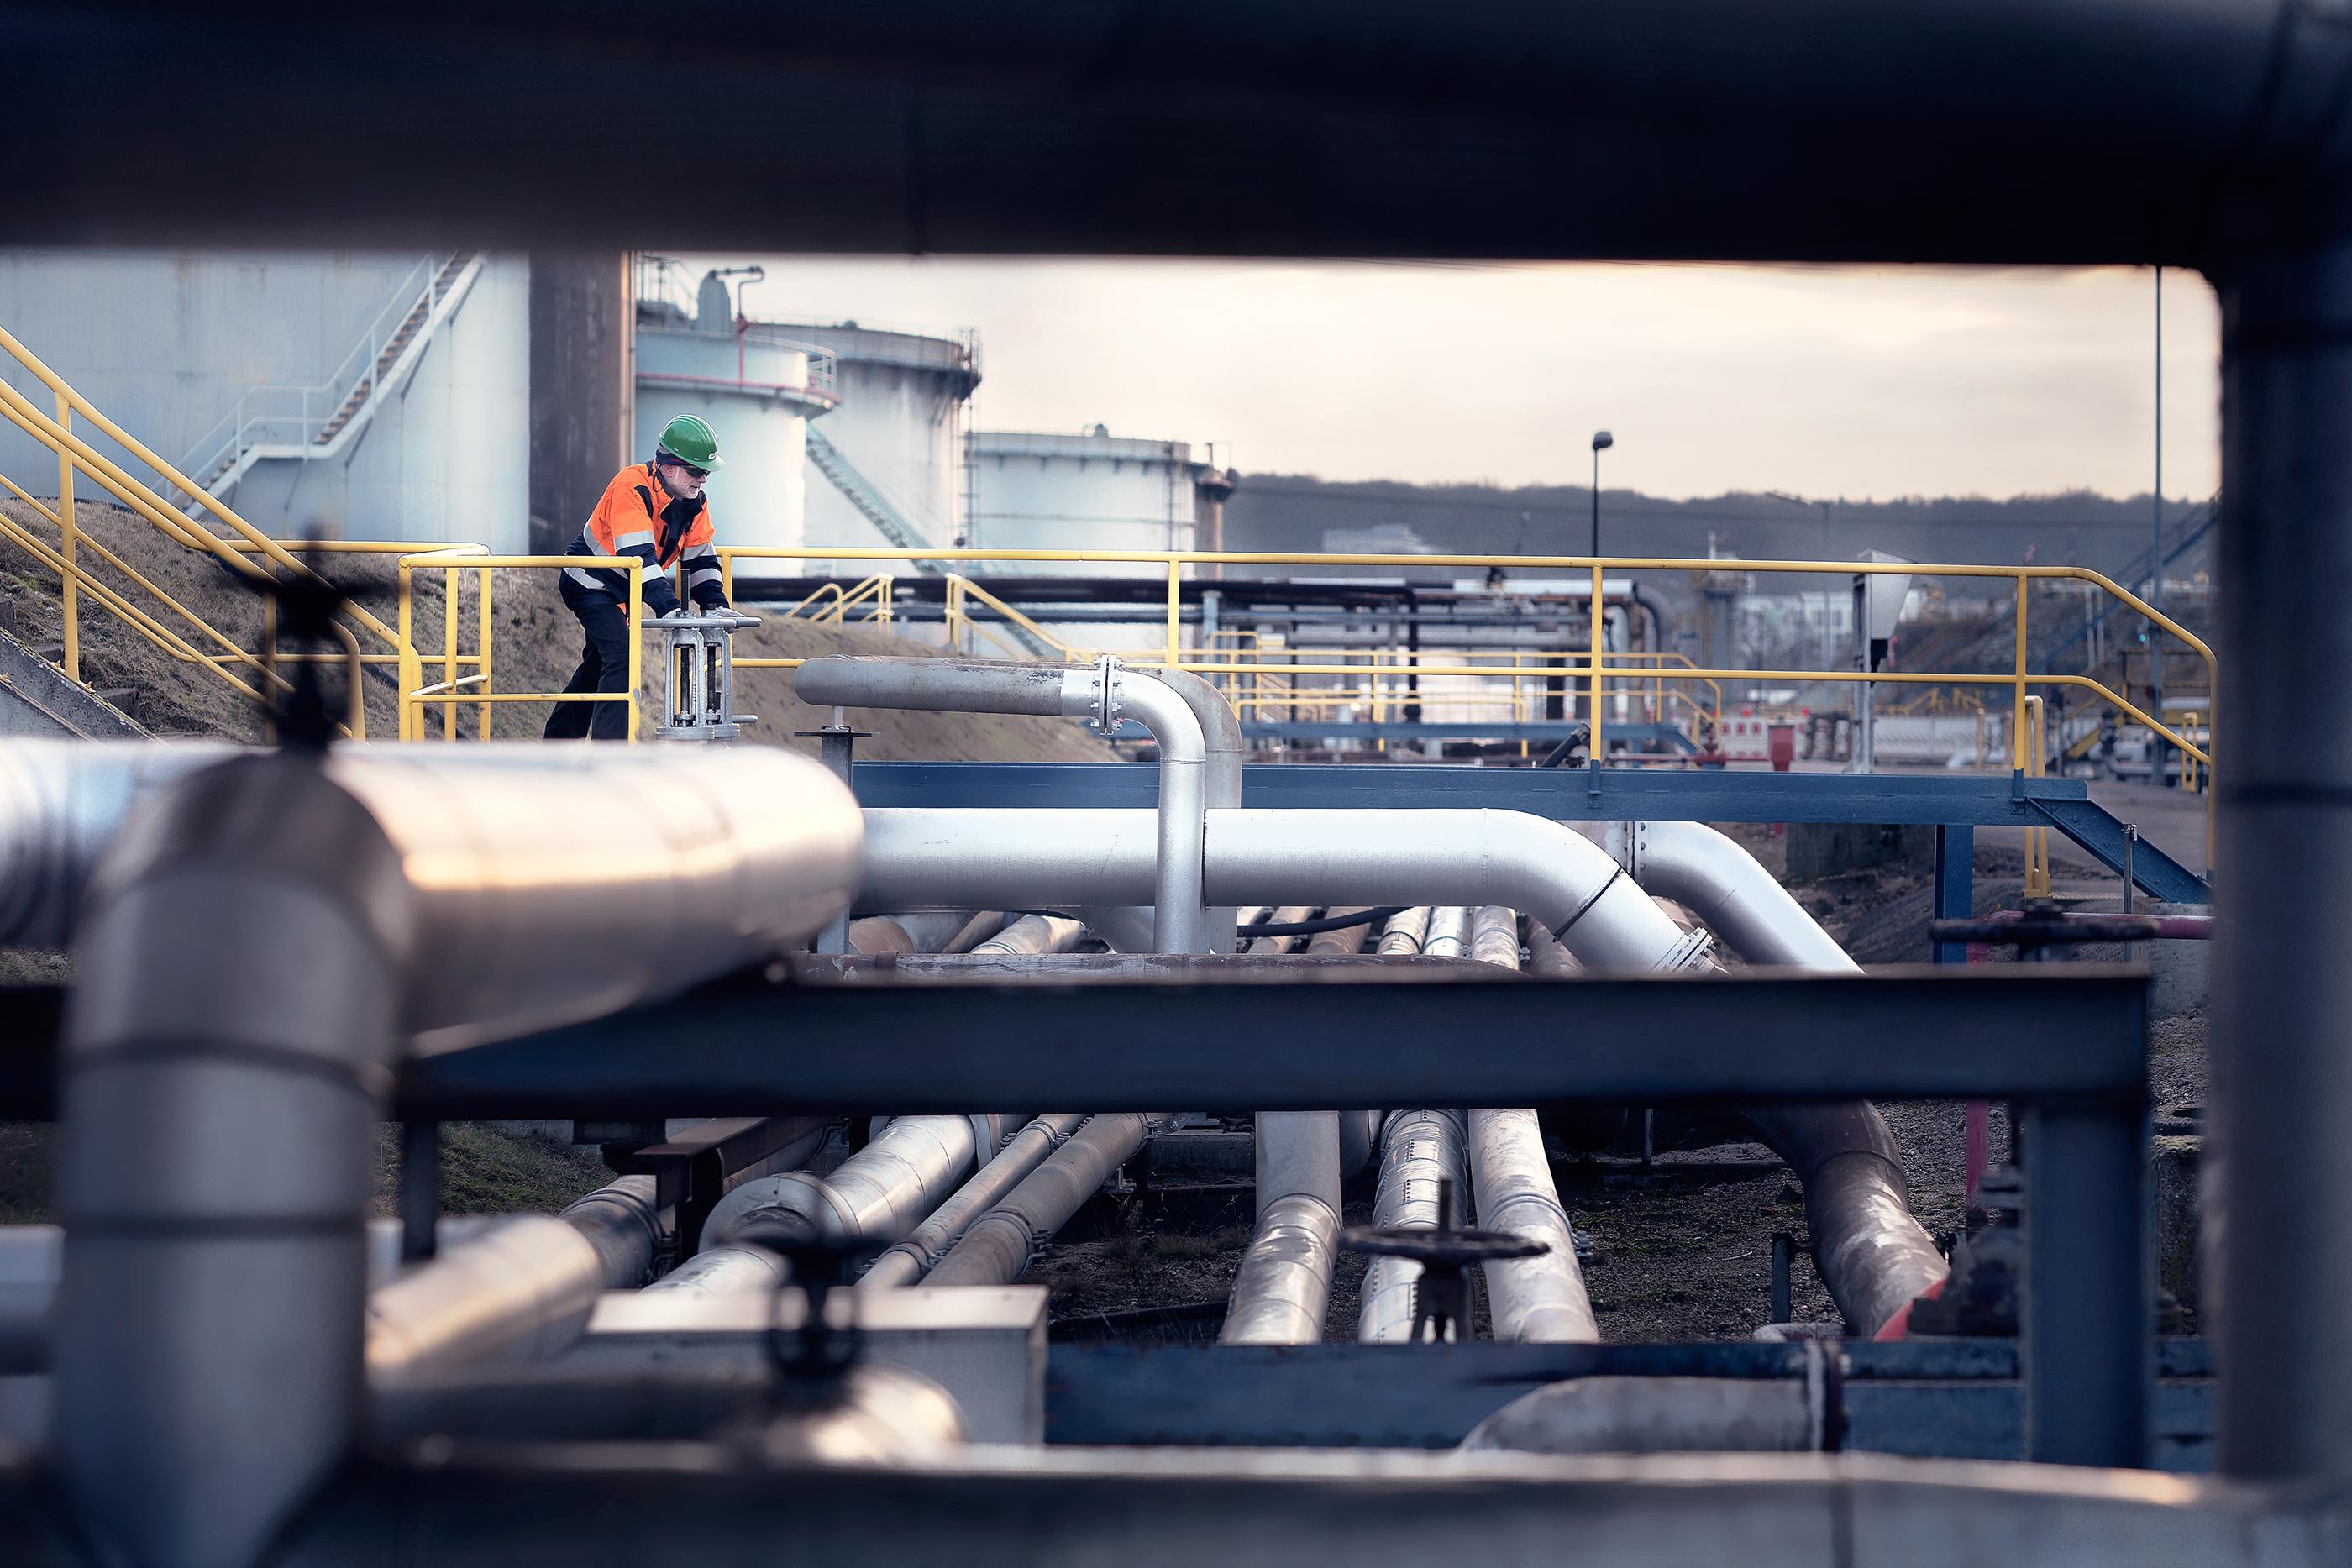 Holborn refinery 5